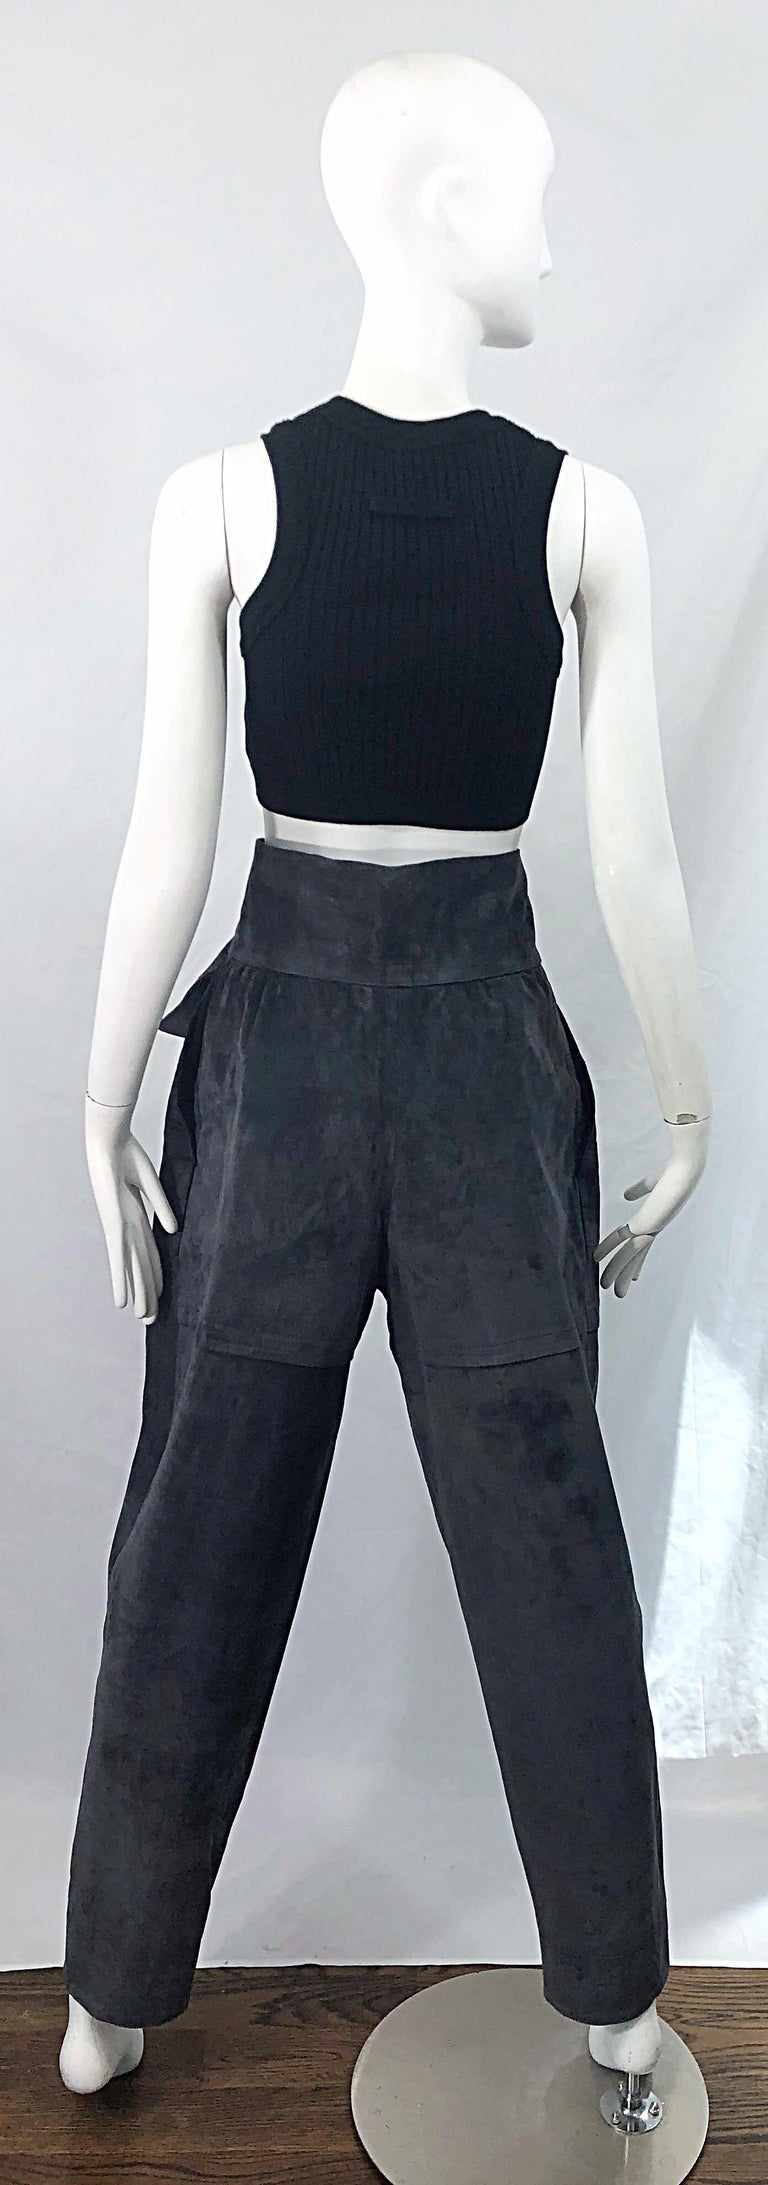 Vintage Yves Saint Laurent YSL 1980s Grey Suede Leather High Waisted Harem Pants For Sale 8